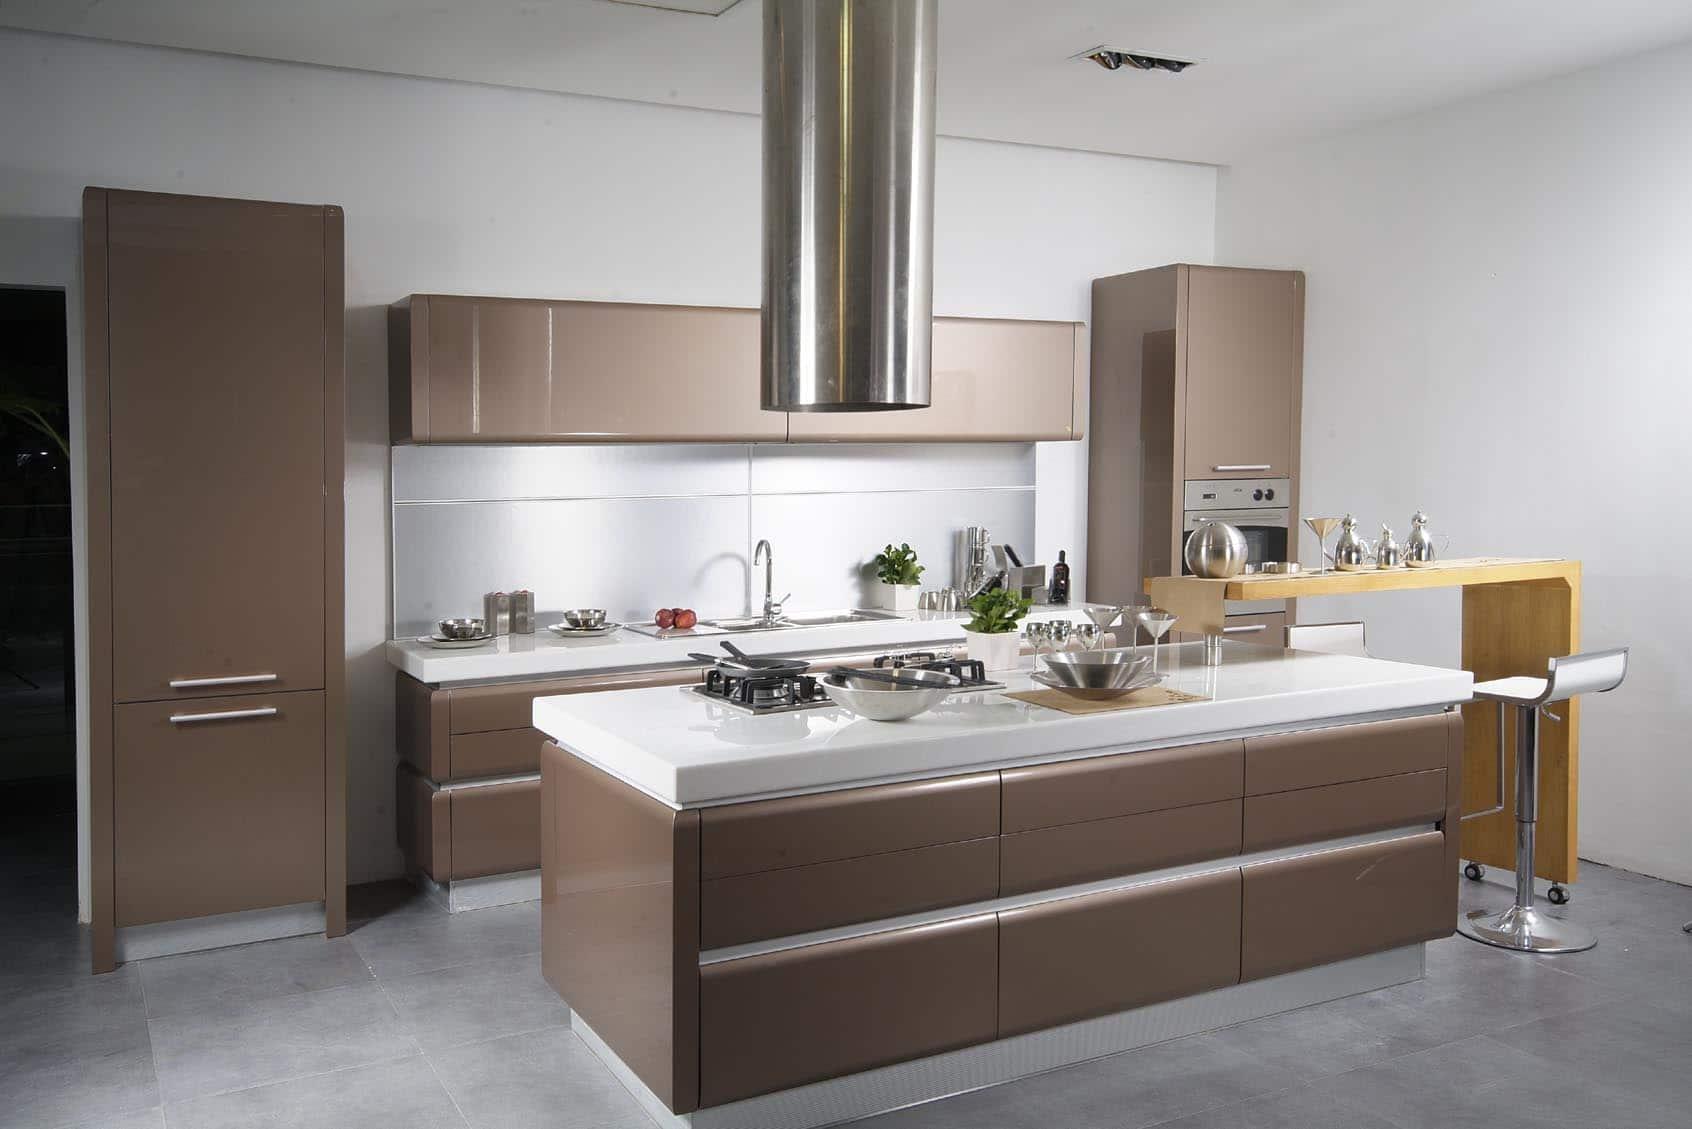 Tendencias de cocinas en 2019 - Armonia Decoración